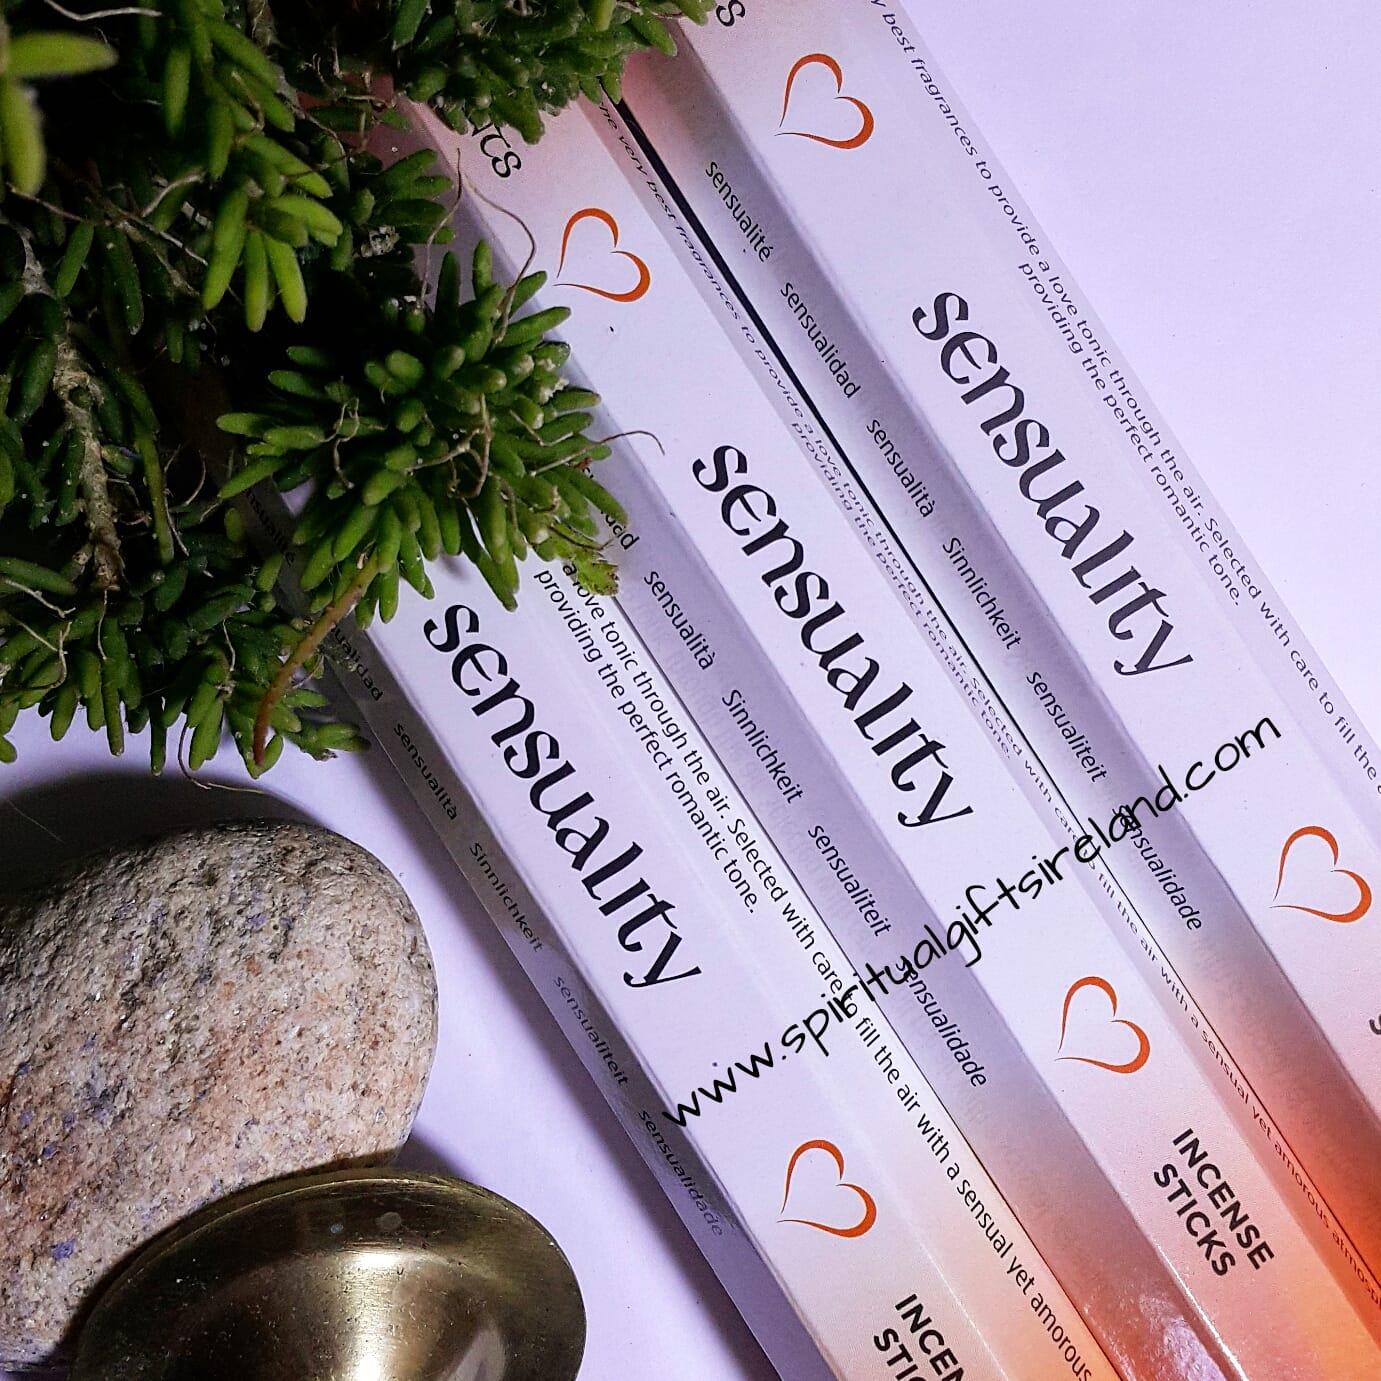 Elements Sensuality Ylang Ylang Nutmeg Patchouli Incense Spiritual Gifts Ireland